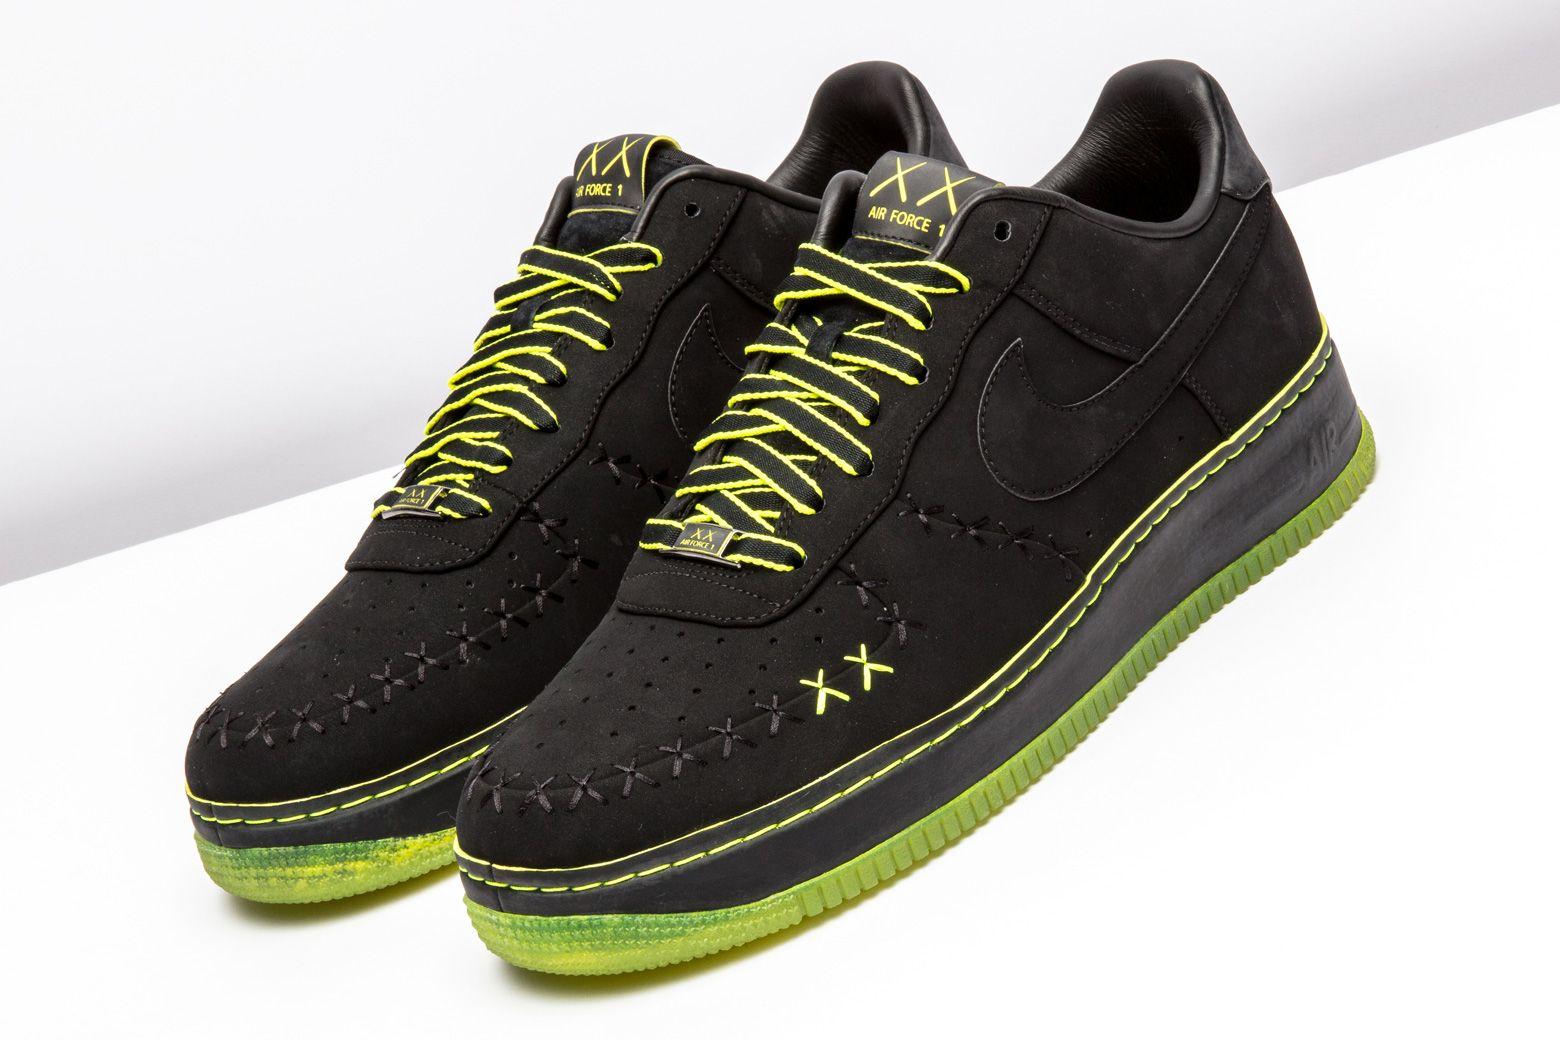 Custom Cactus Jack Air Force 1s Sneaker Freaker